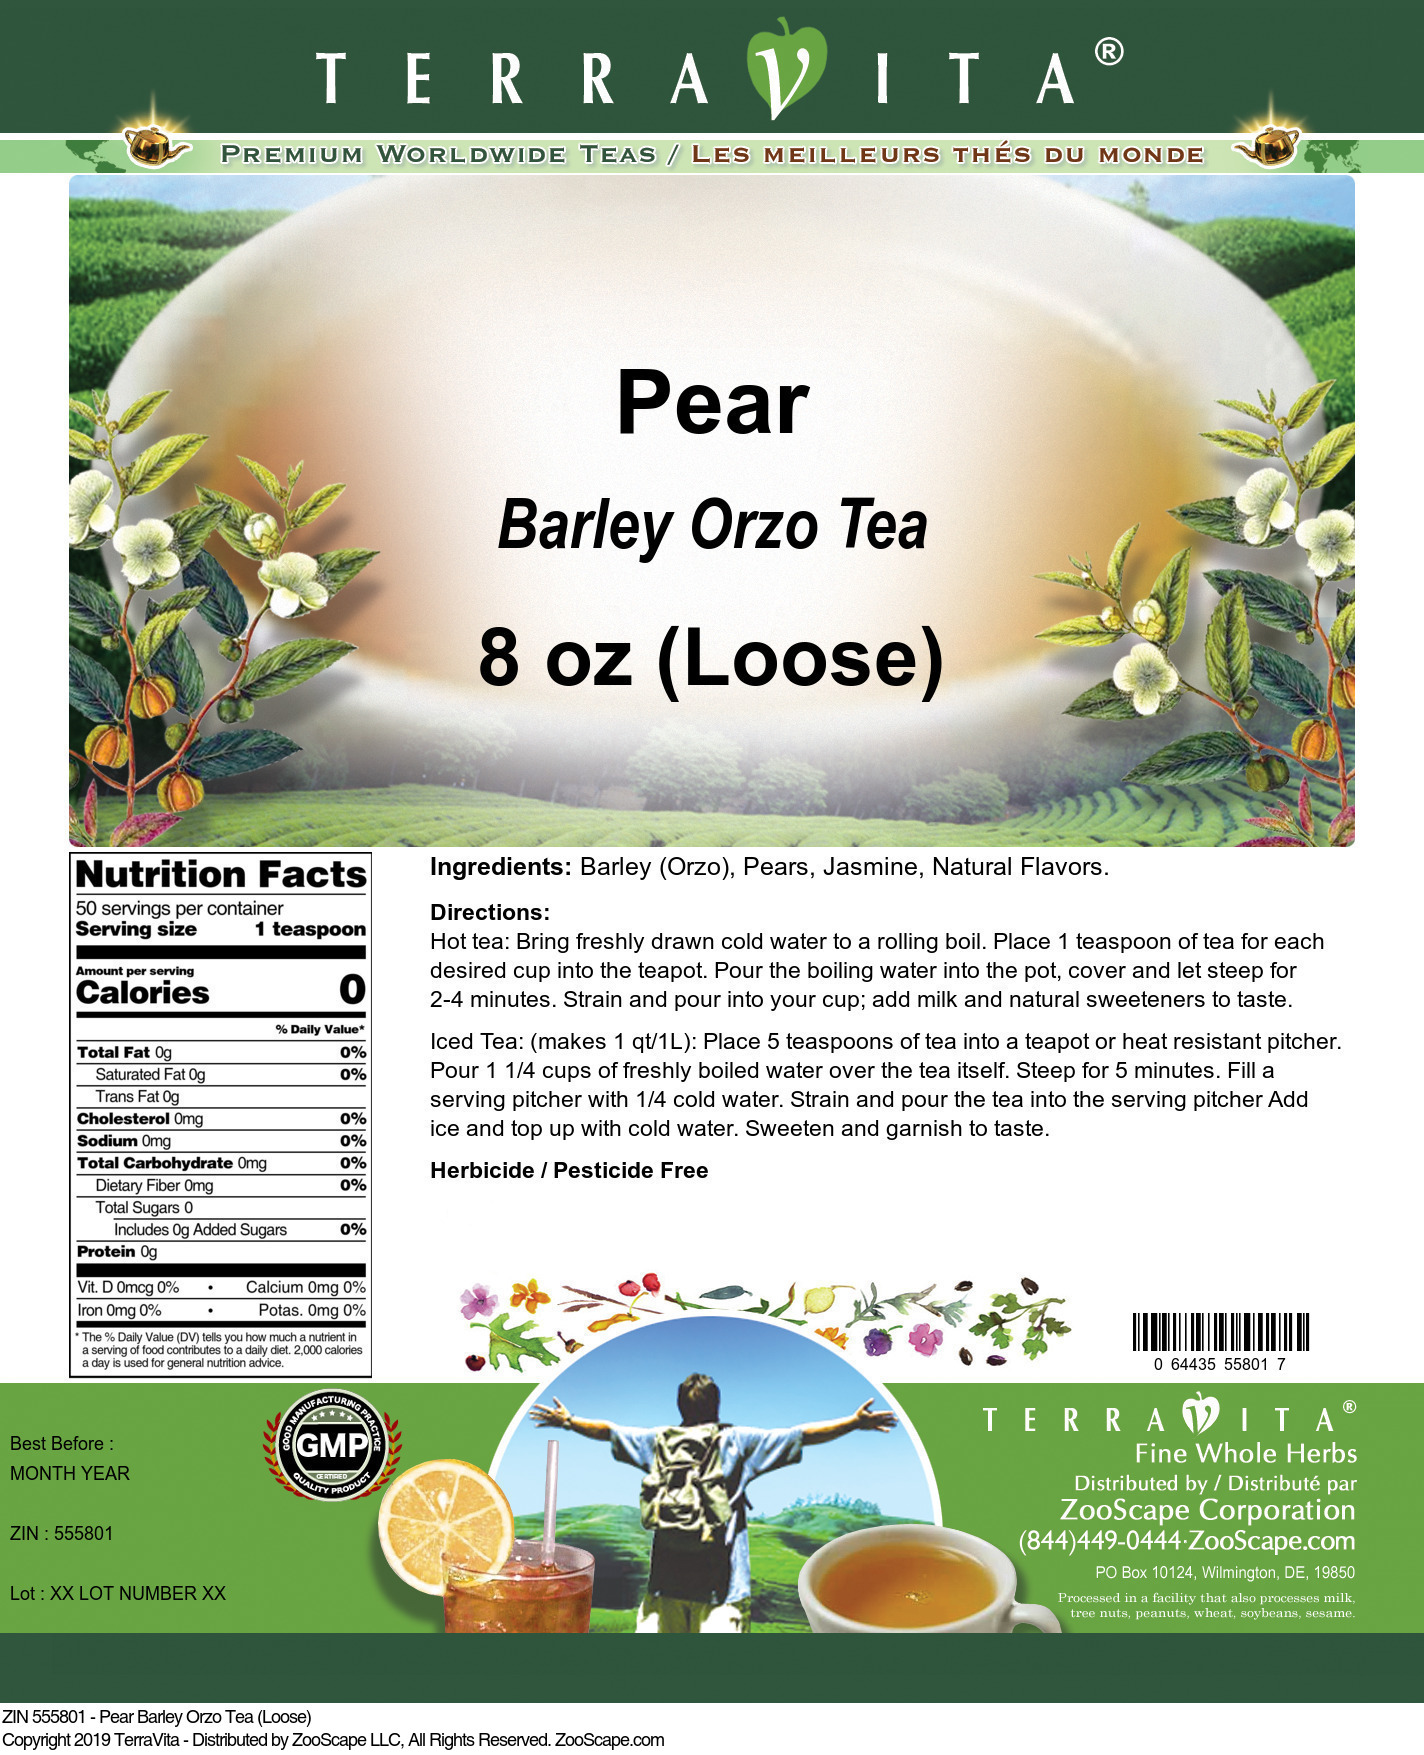 Pear Barley Orzo Tea (Loose)